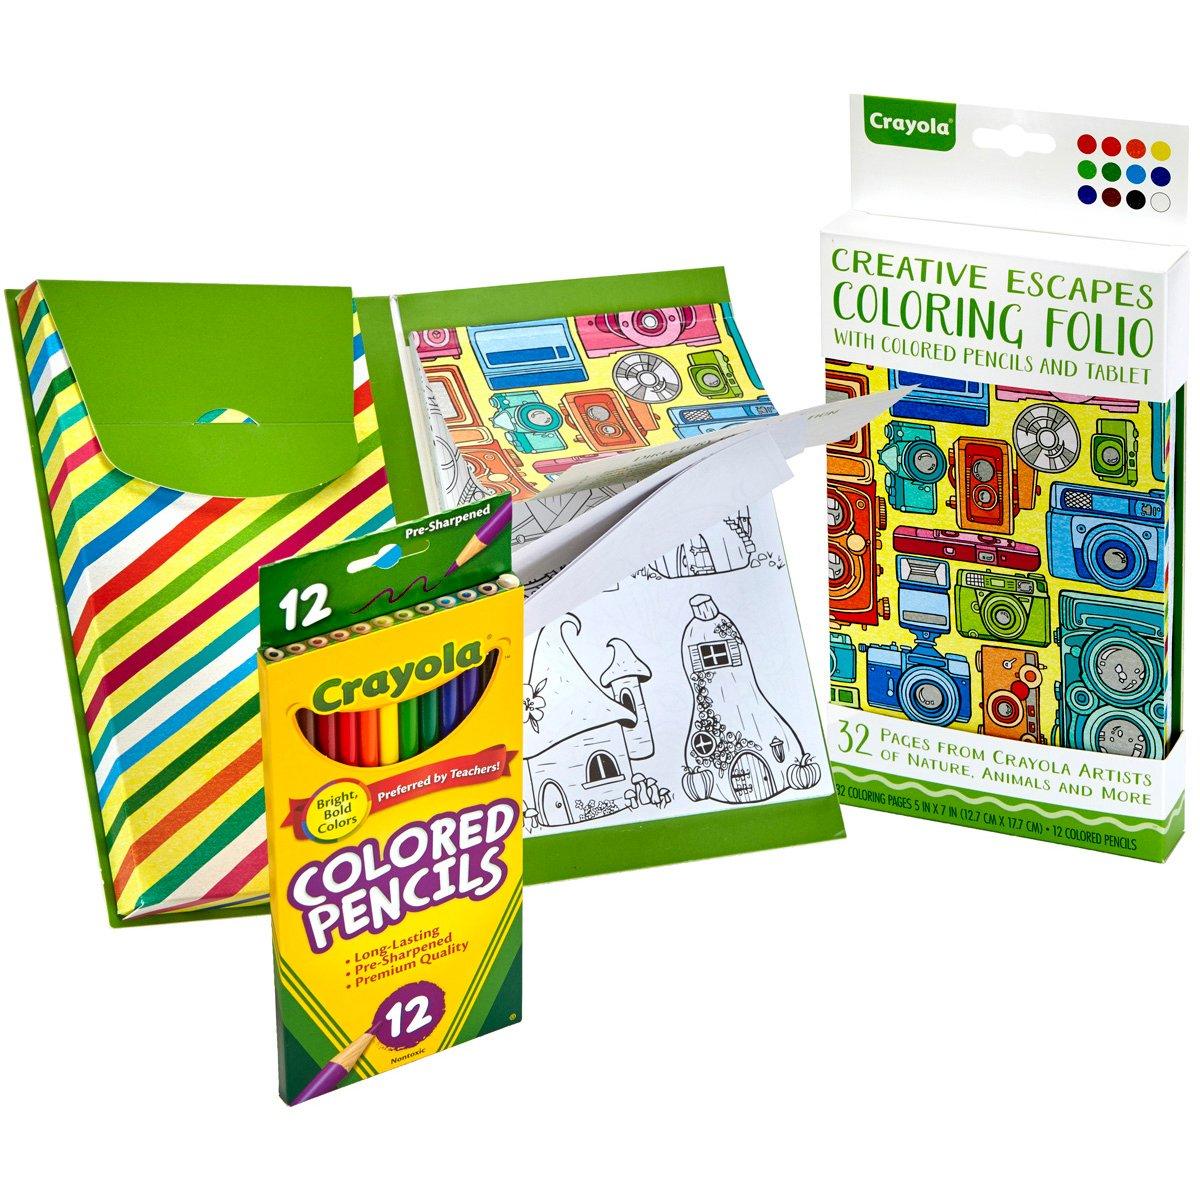 Amazon.com: Crayola Creative Escapes Aged Up Coloring Folio with ...